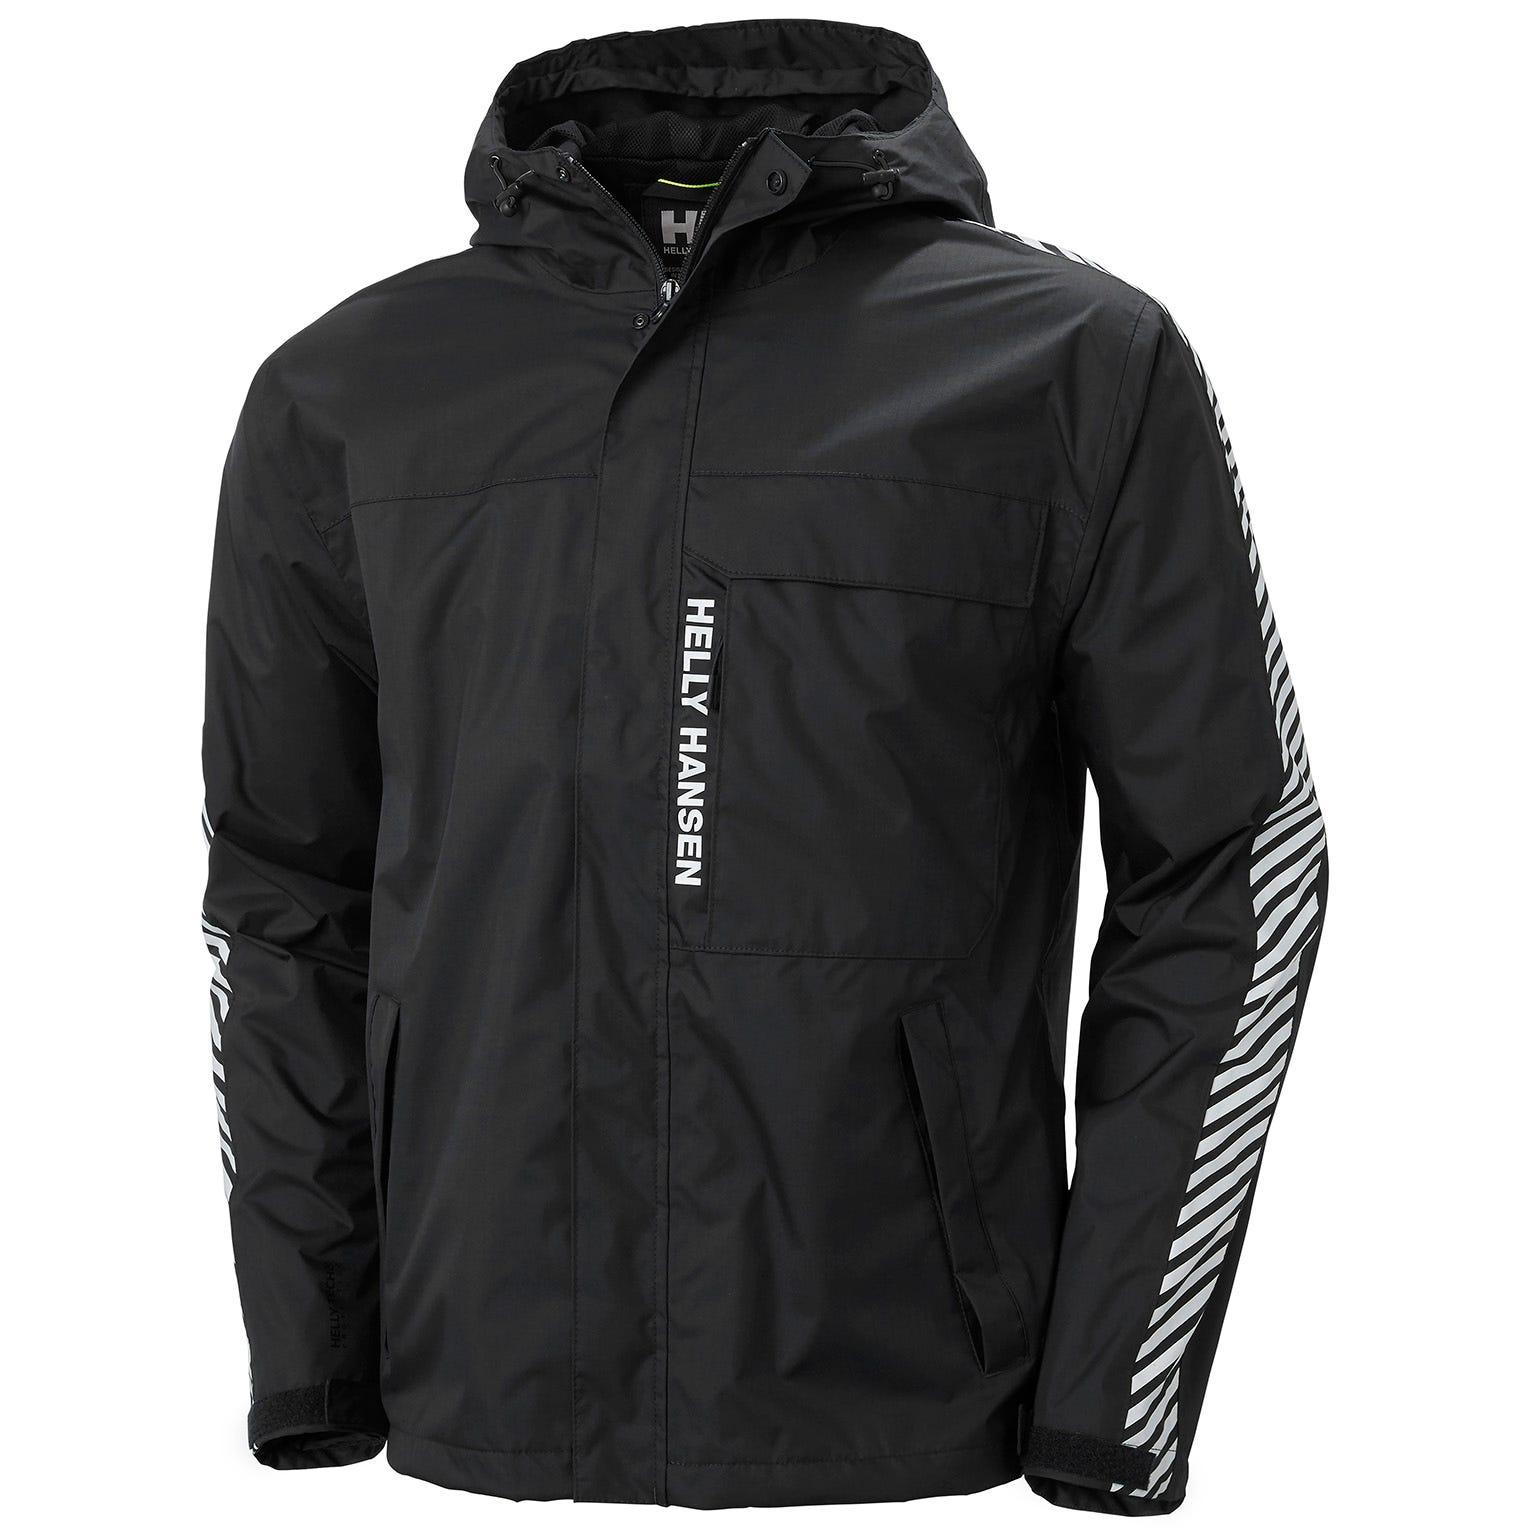 Helly Hansen Mens Vector Packable Summer Rain Jacket Black M